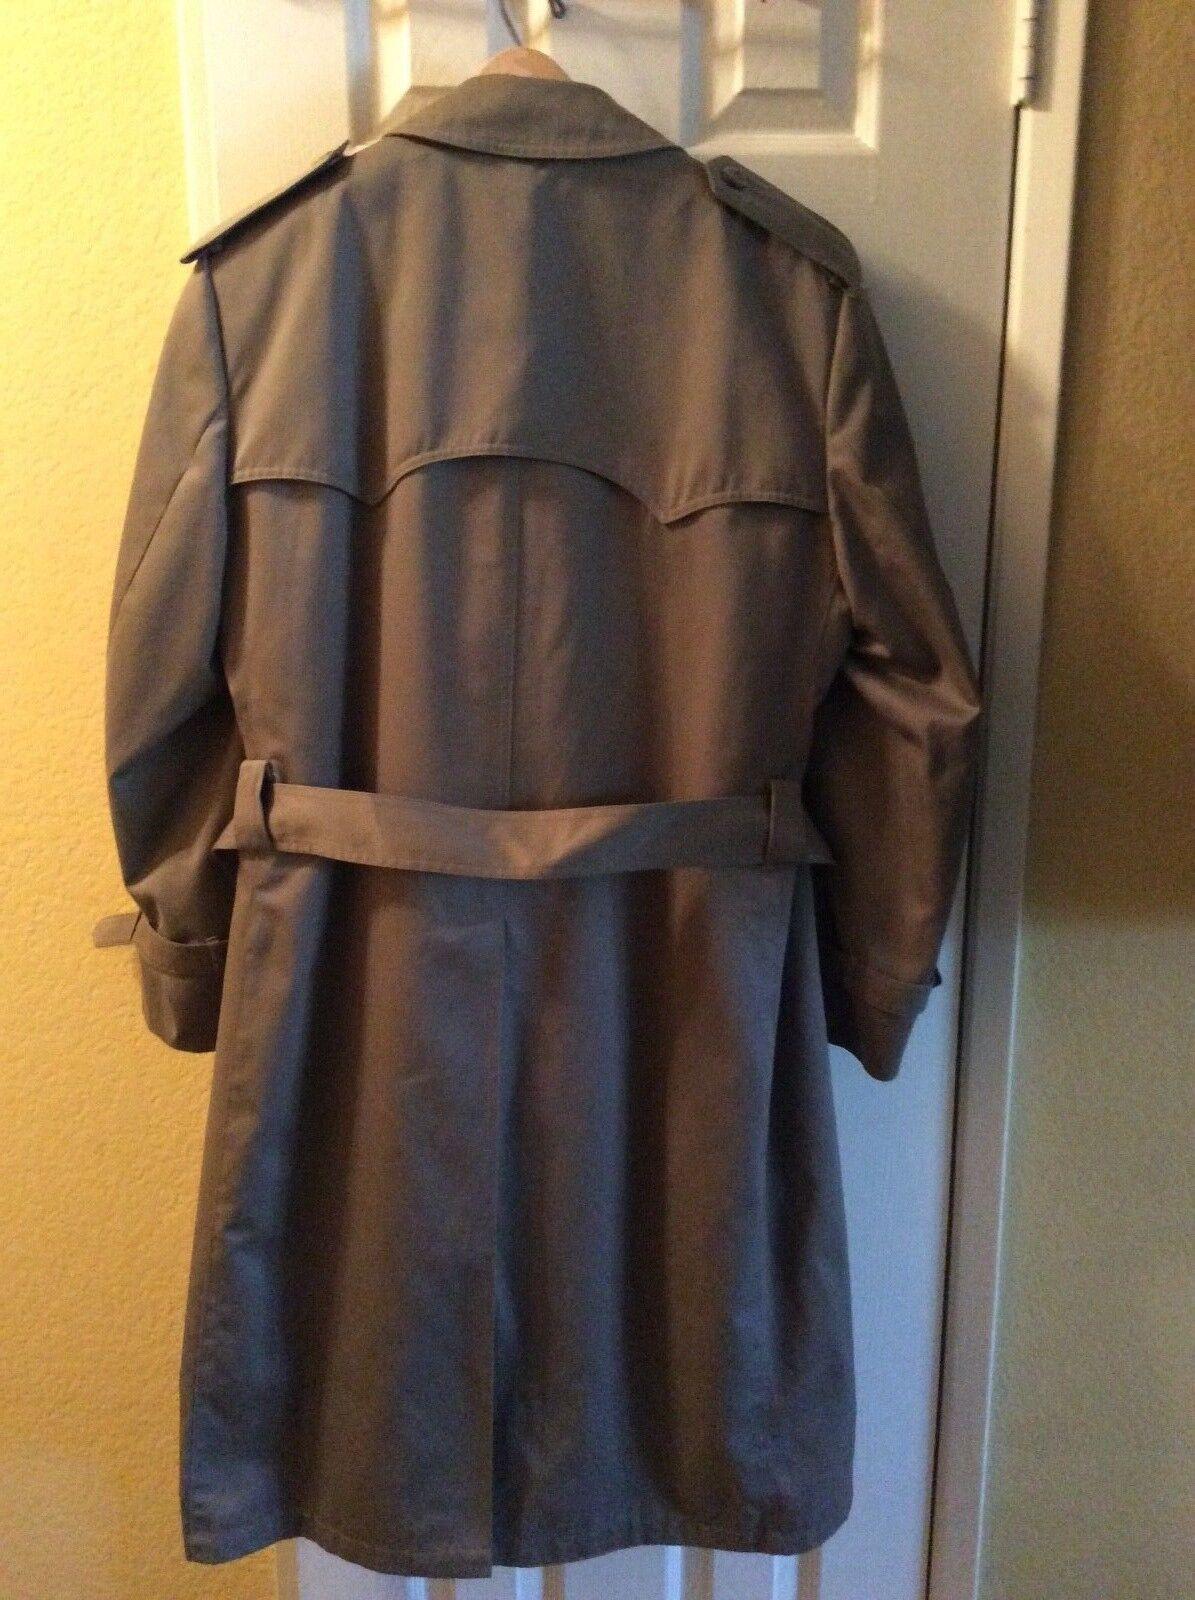 Men's Khaki  Lined Trench Coat  40R  Virtually NEW    London Fog Style